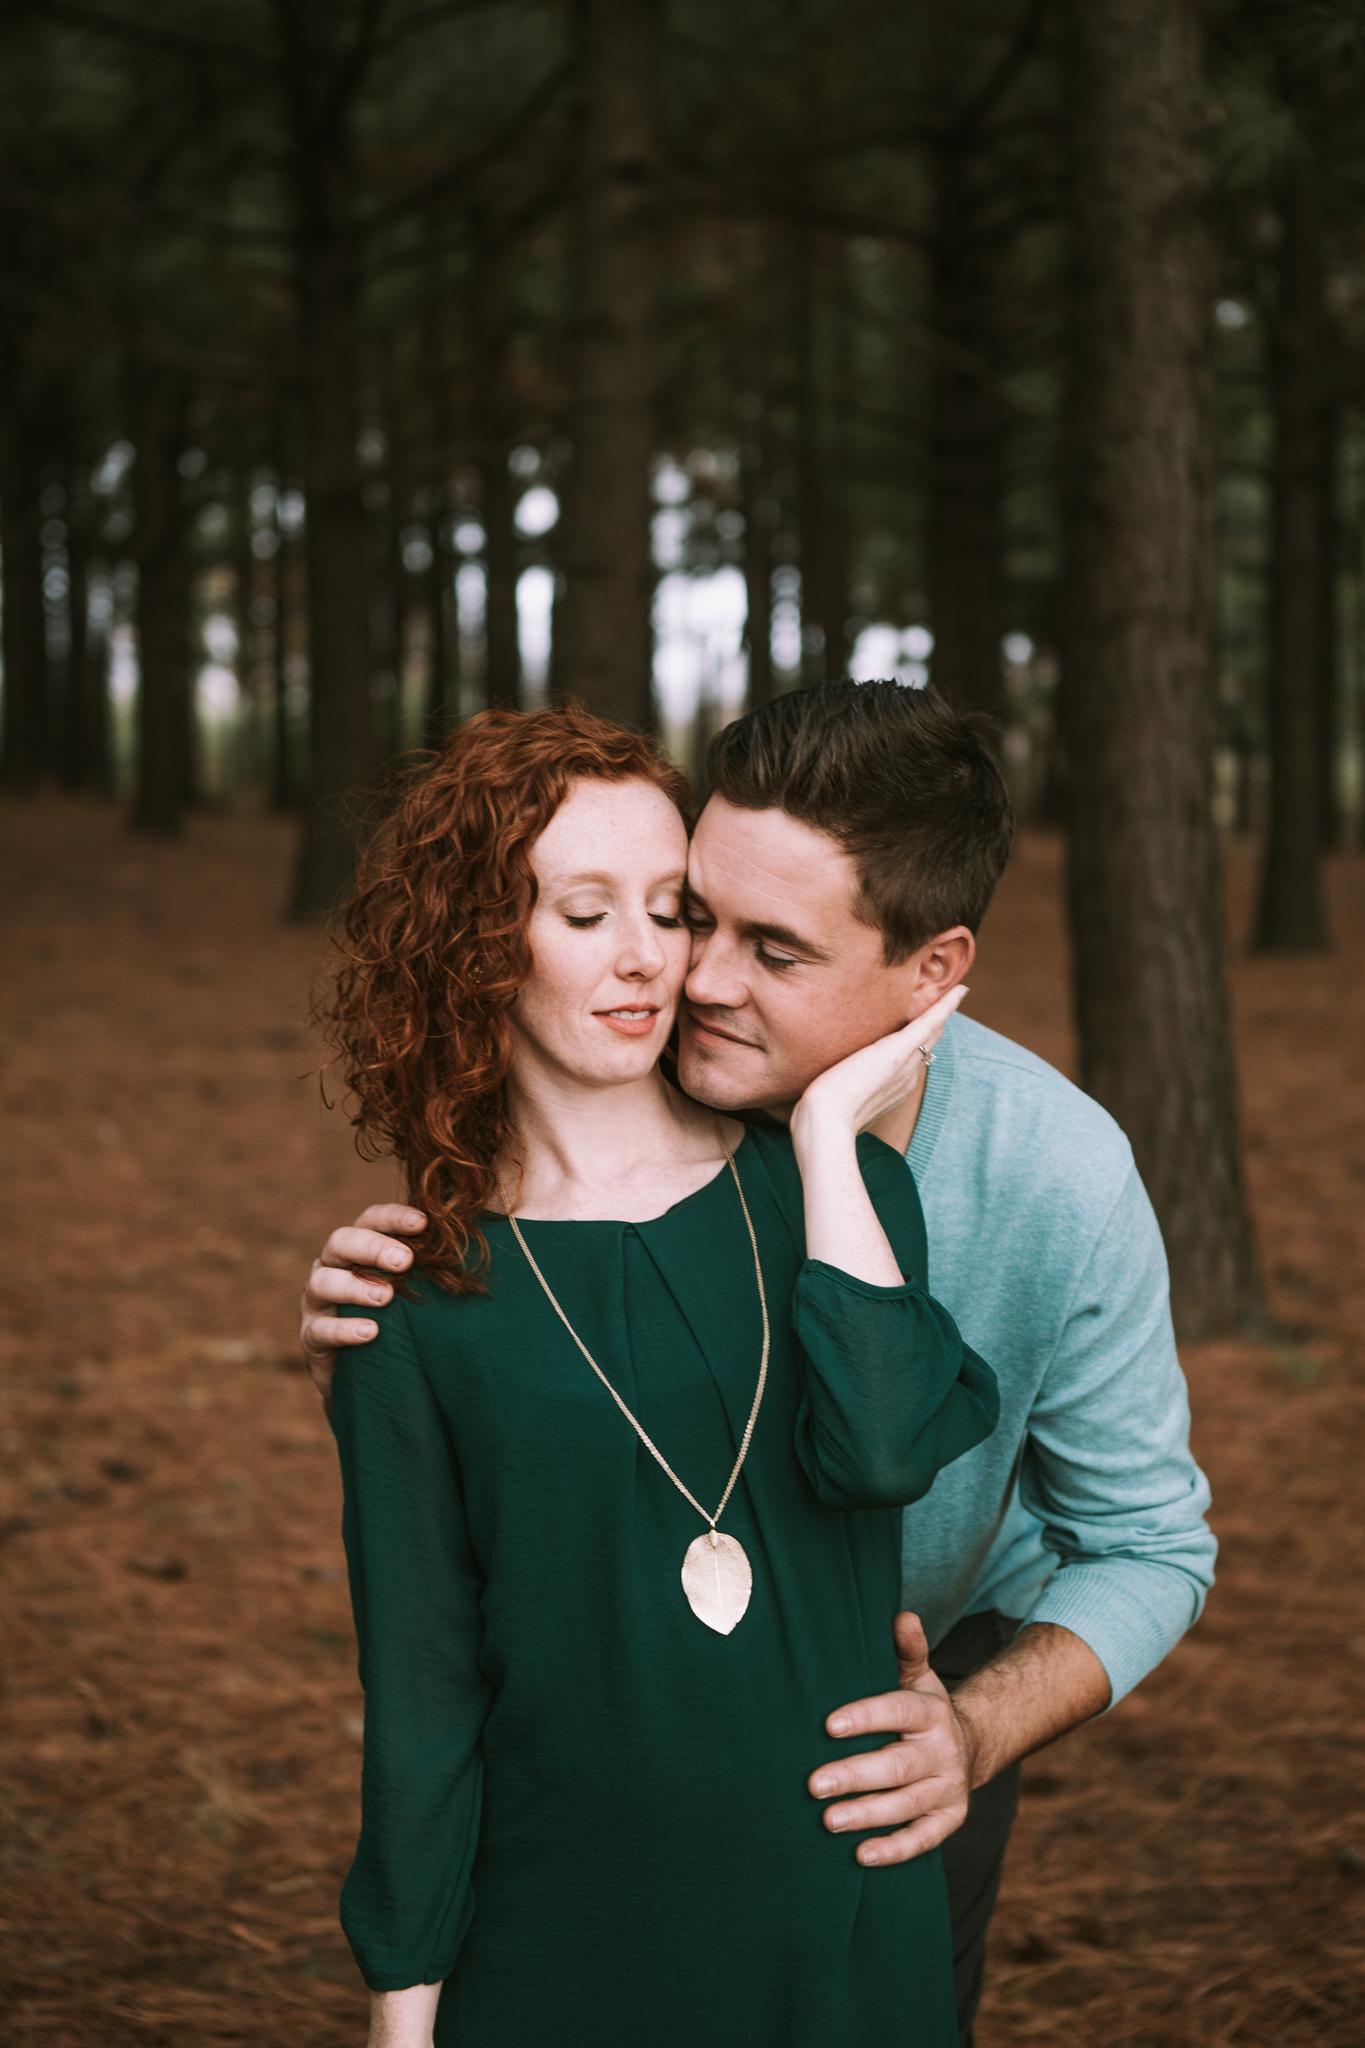 Richmond Kentucky Engagement Photographer - Ariana Jordan Photography -39.jpg